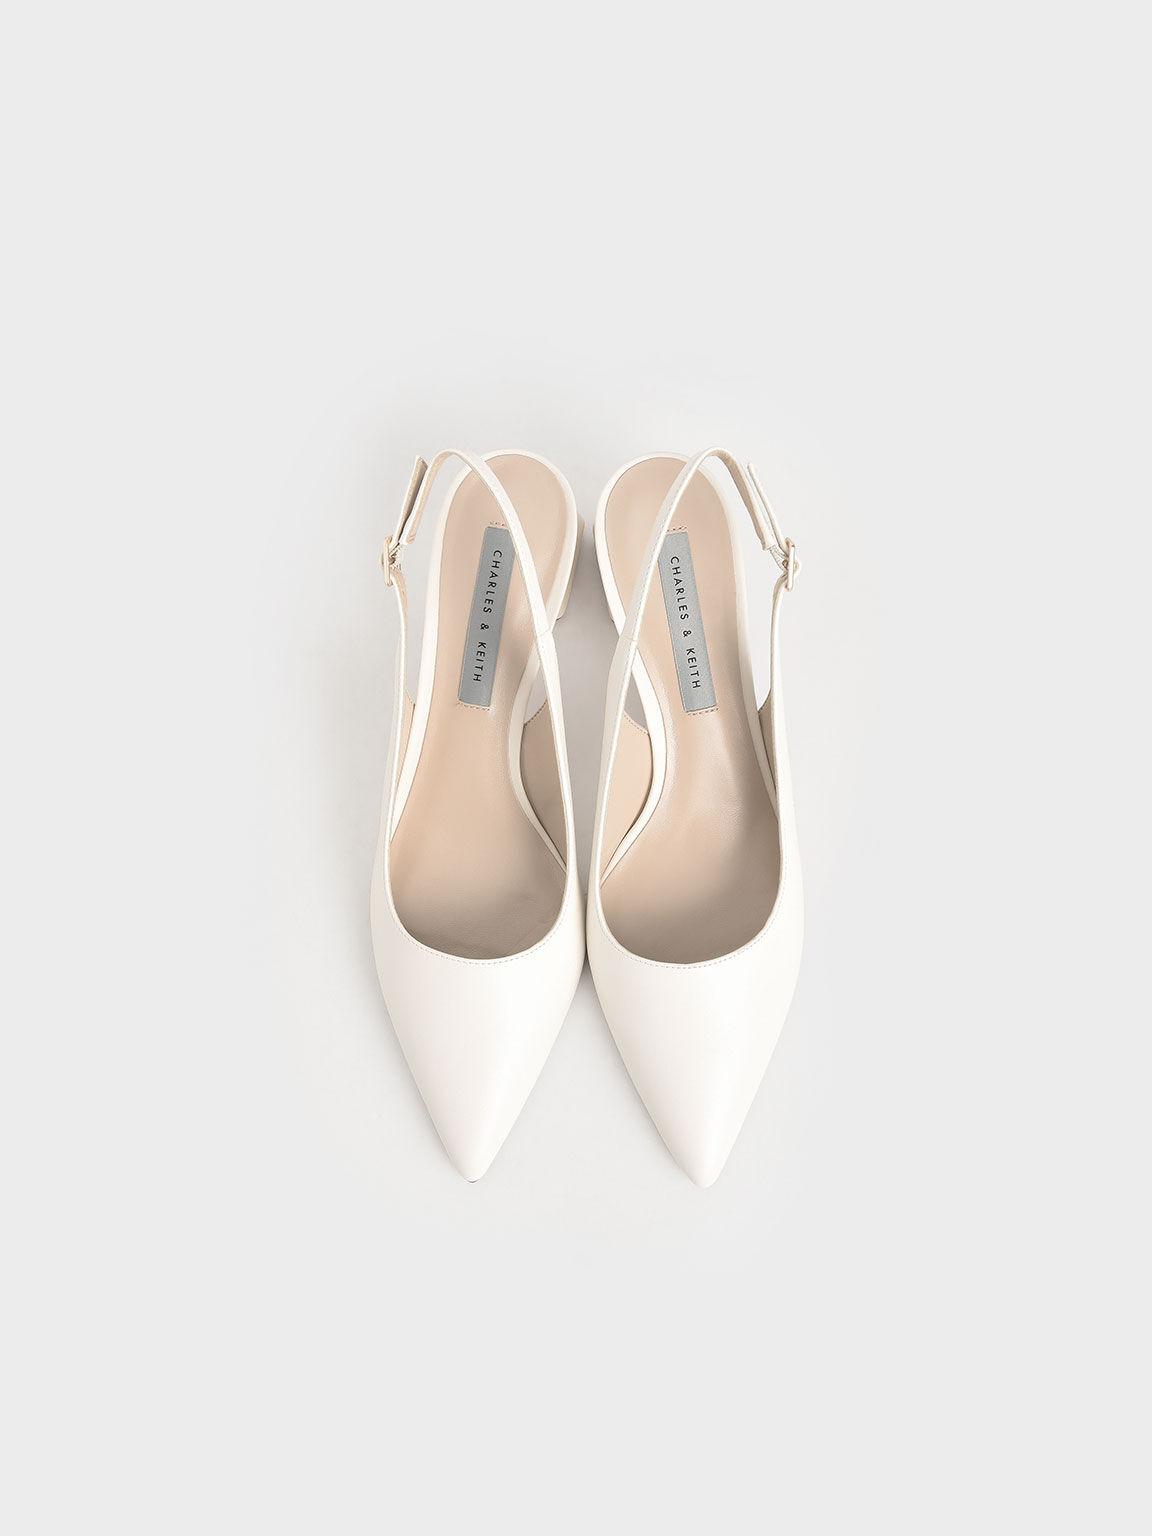 Metallic Accent Slingback Court Shoes, Cream, hi-res